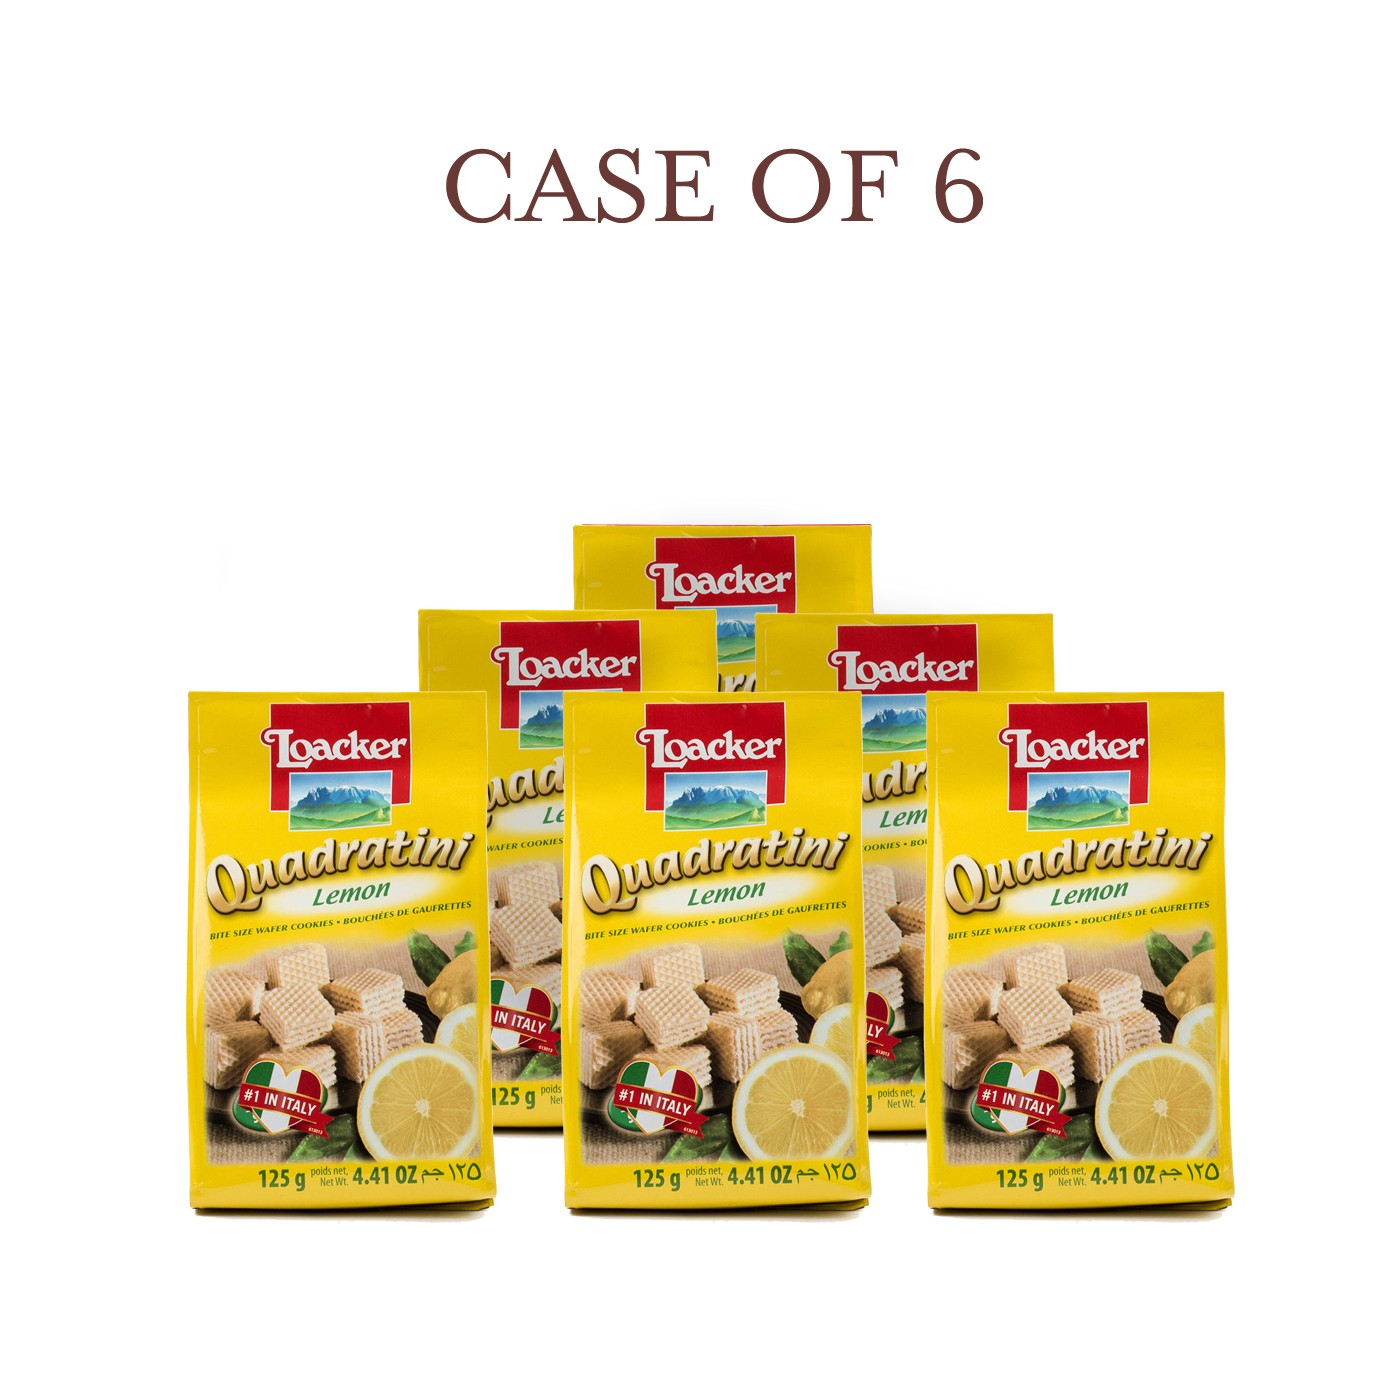 Lemon Quadratini - Case of 6